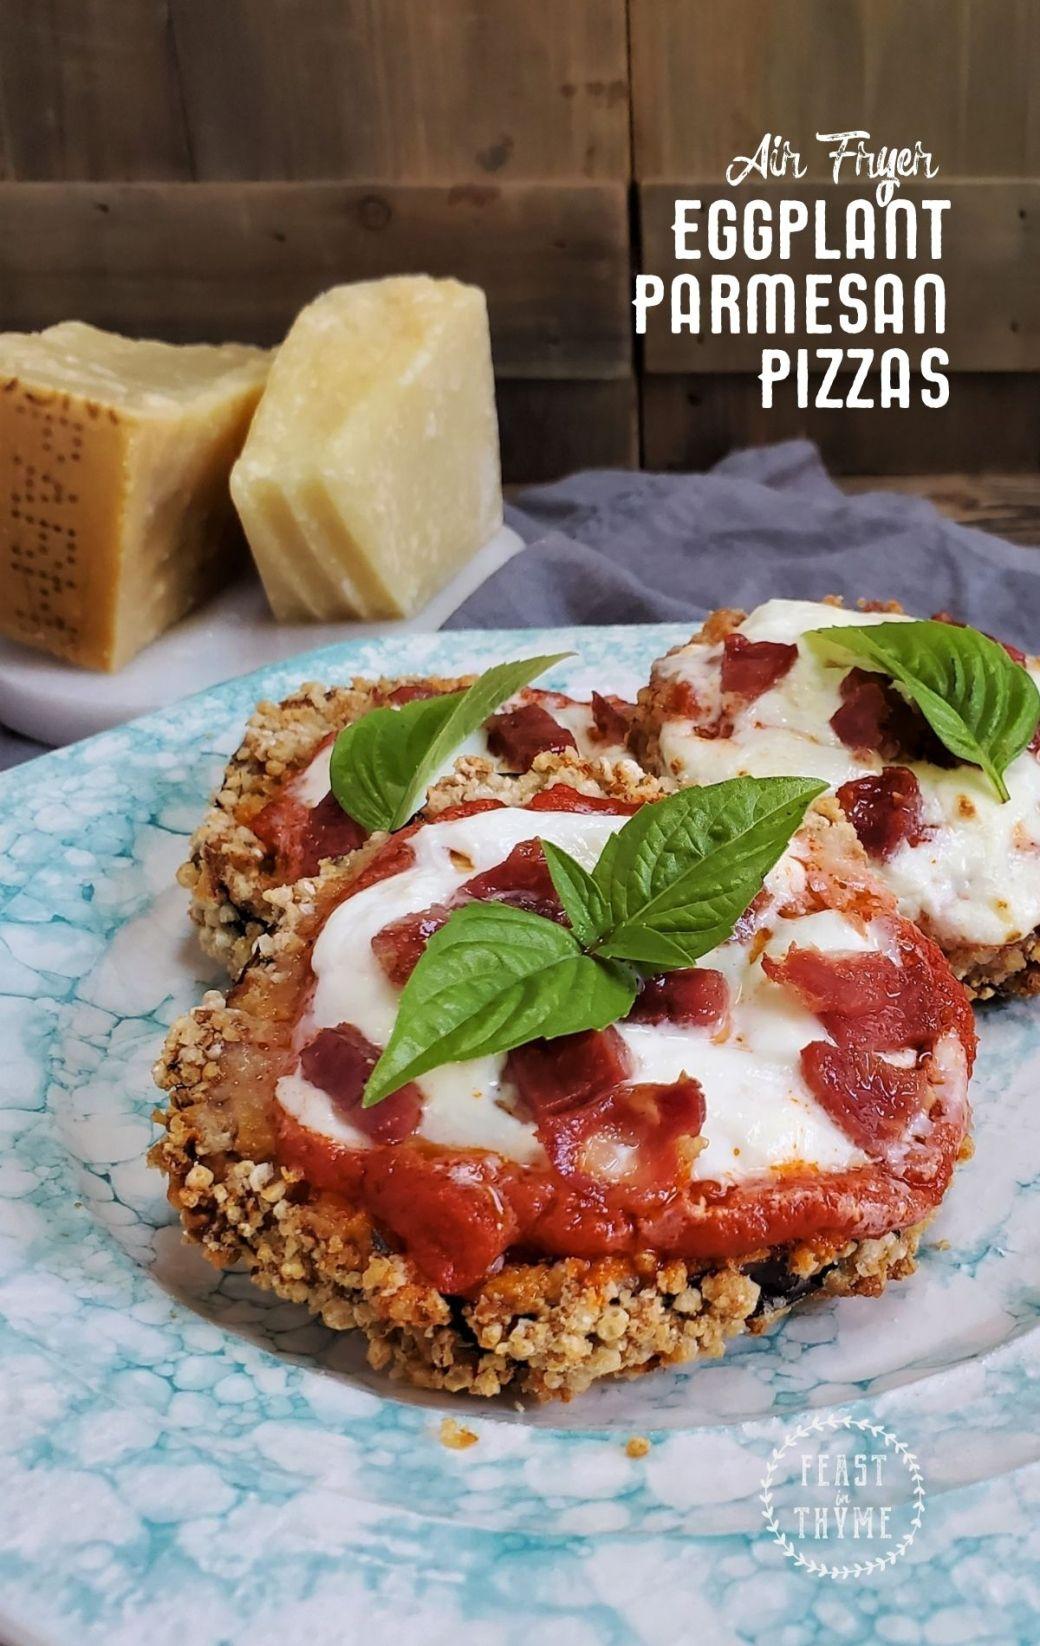 Air Fryer Eggplant Parmesan Pizzas [Gluten-Free]